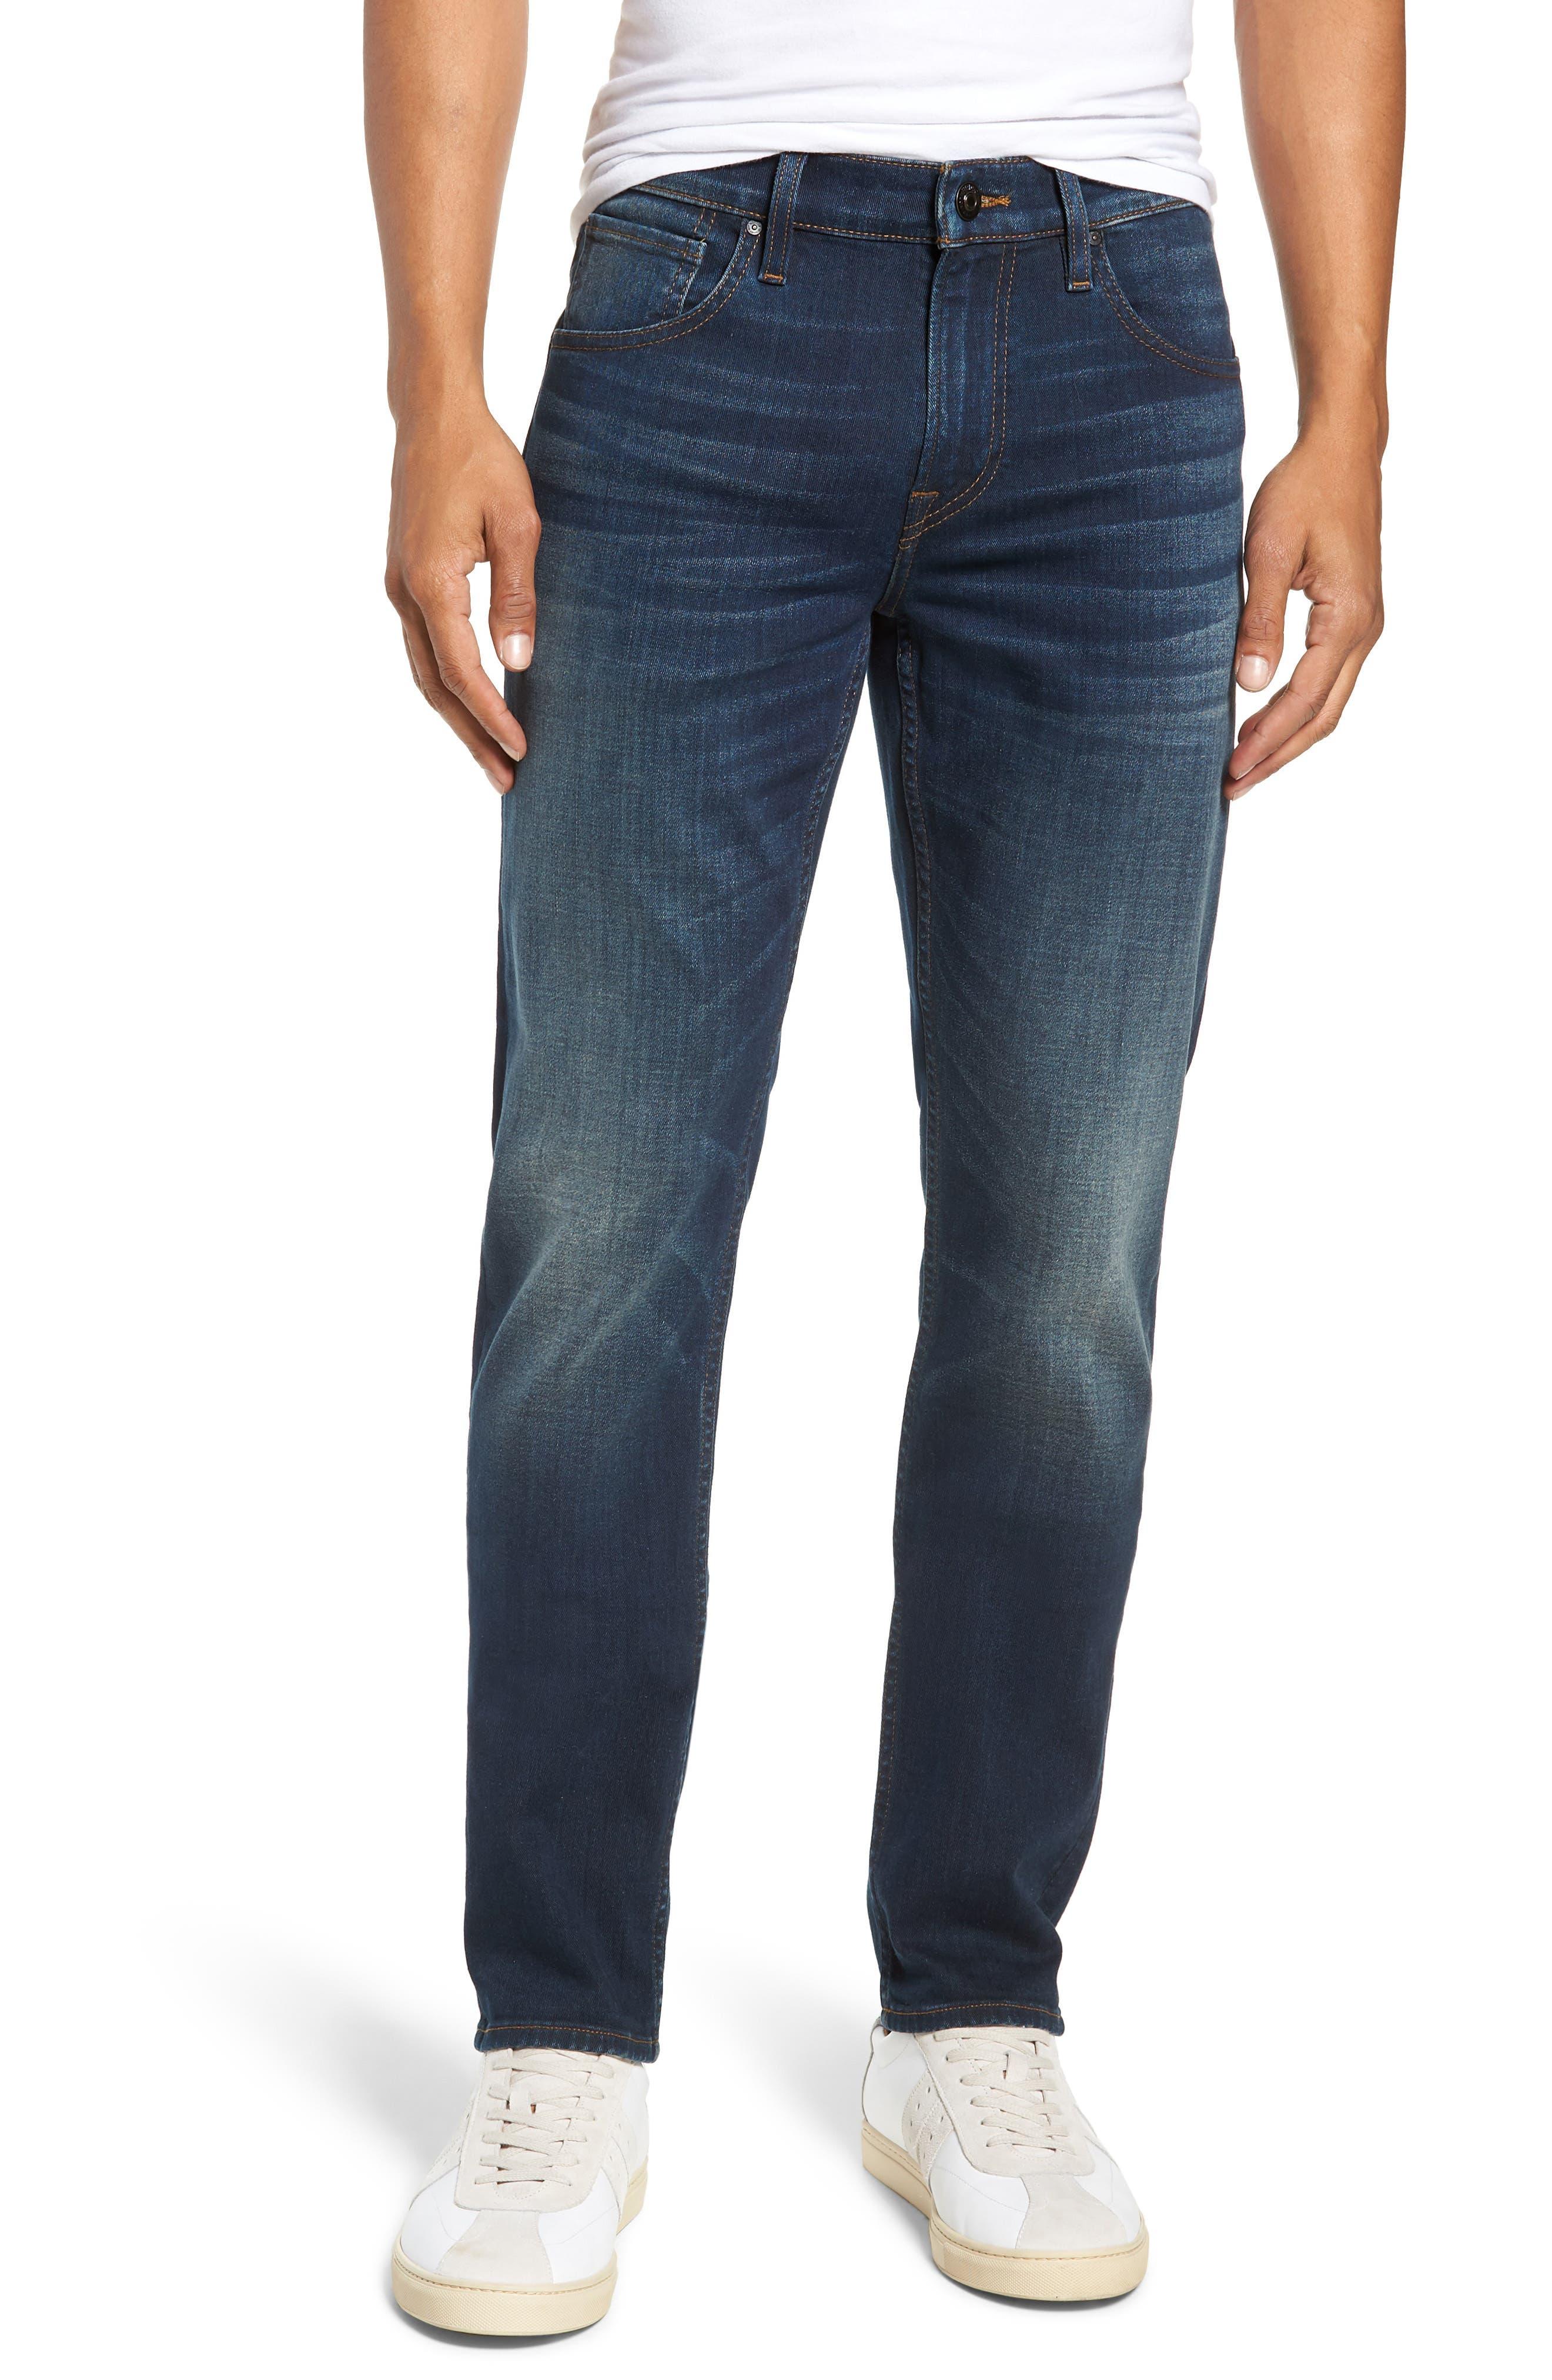 HUDSON JEANS Blake Slim Fit Straight Leg Jeans, Main, color, NORWOOD